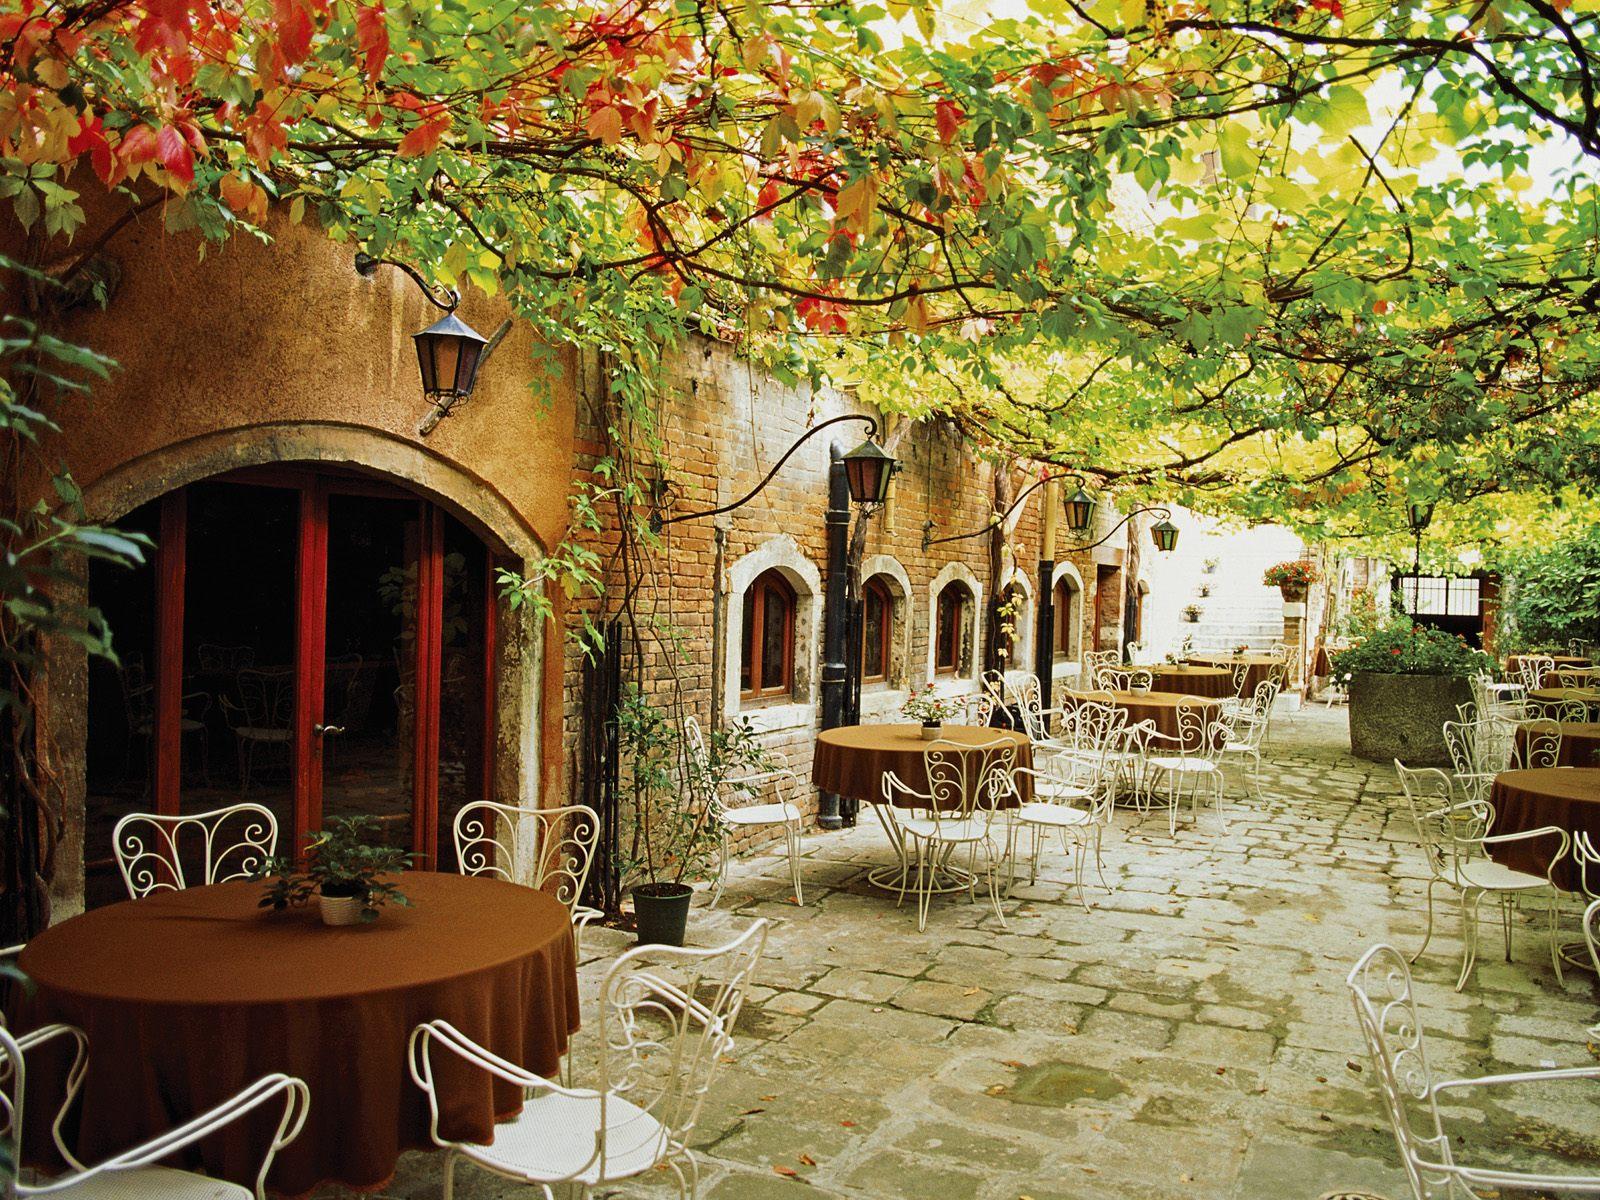 italy venice romantic place most places italian italia dining amazing around tuscany cafe cities alfresco restaurant beauty outdoor venezia venecia